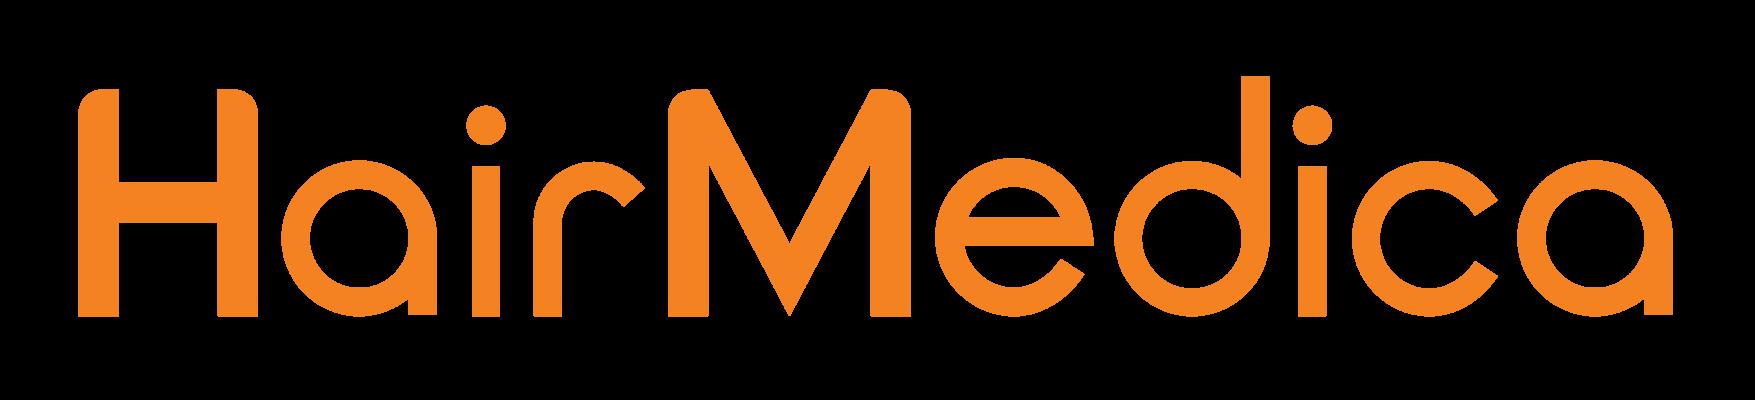 HairMedica logo